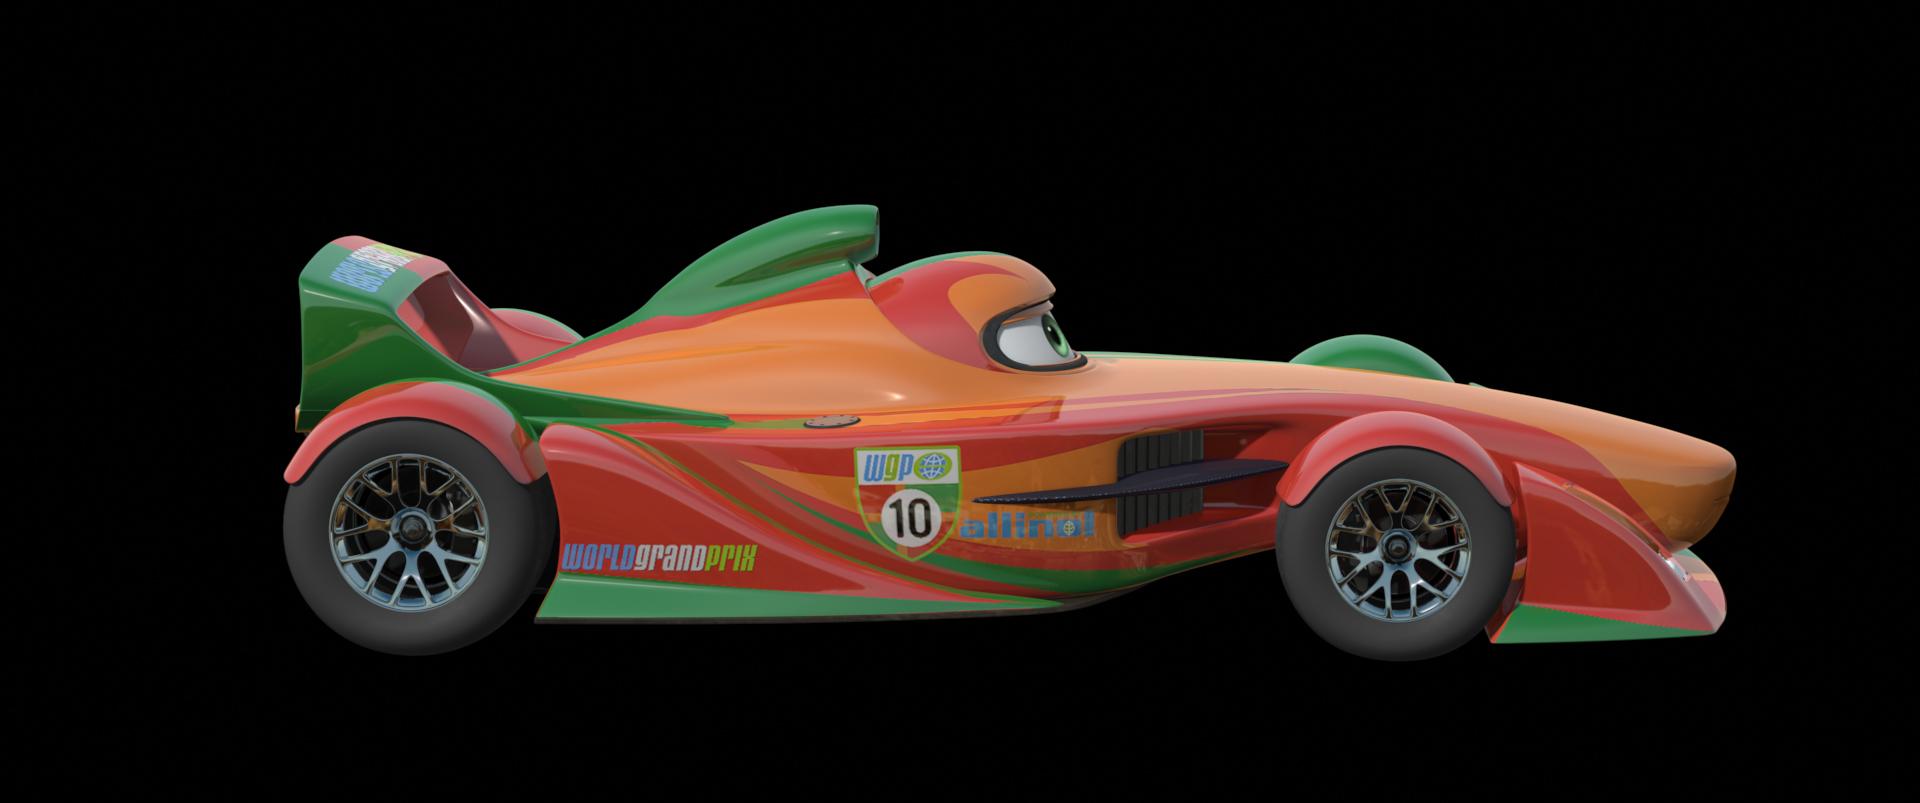 Cars 2 International Racers Line-up